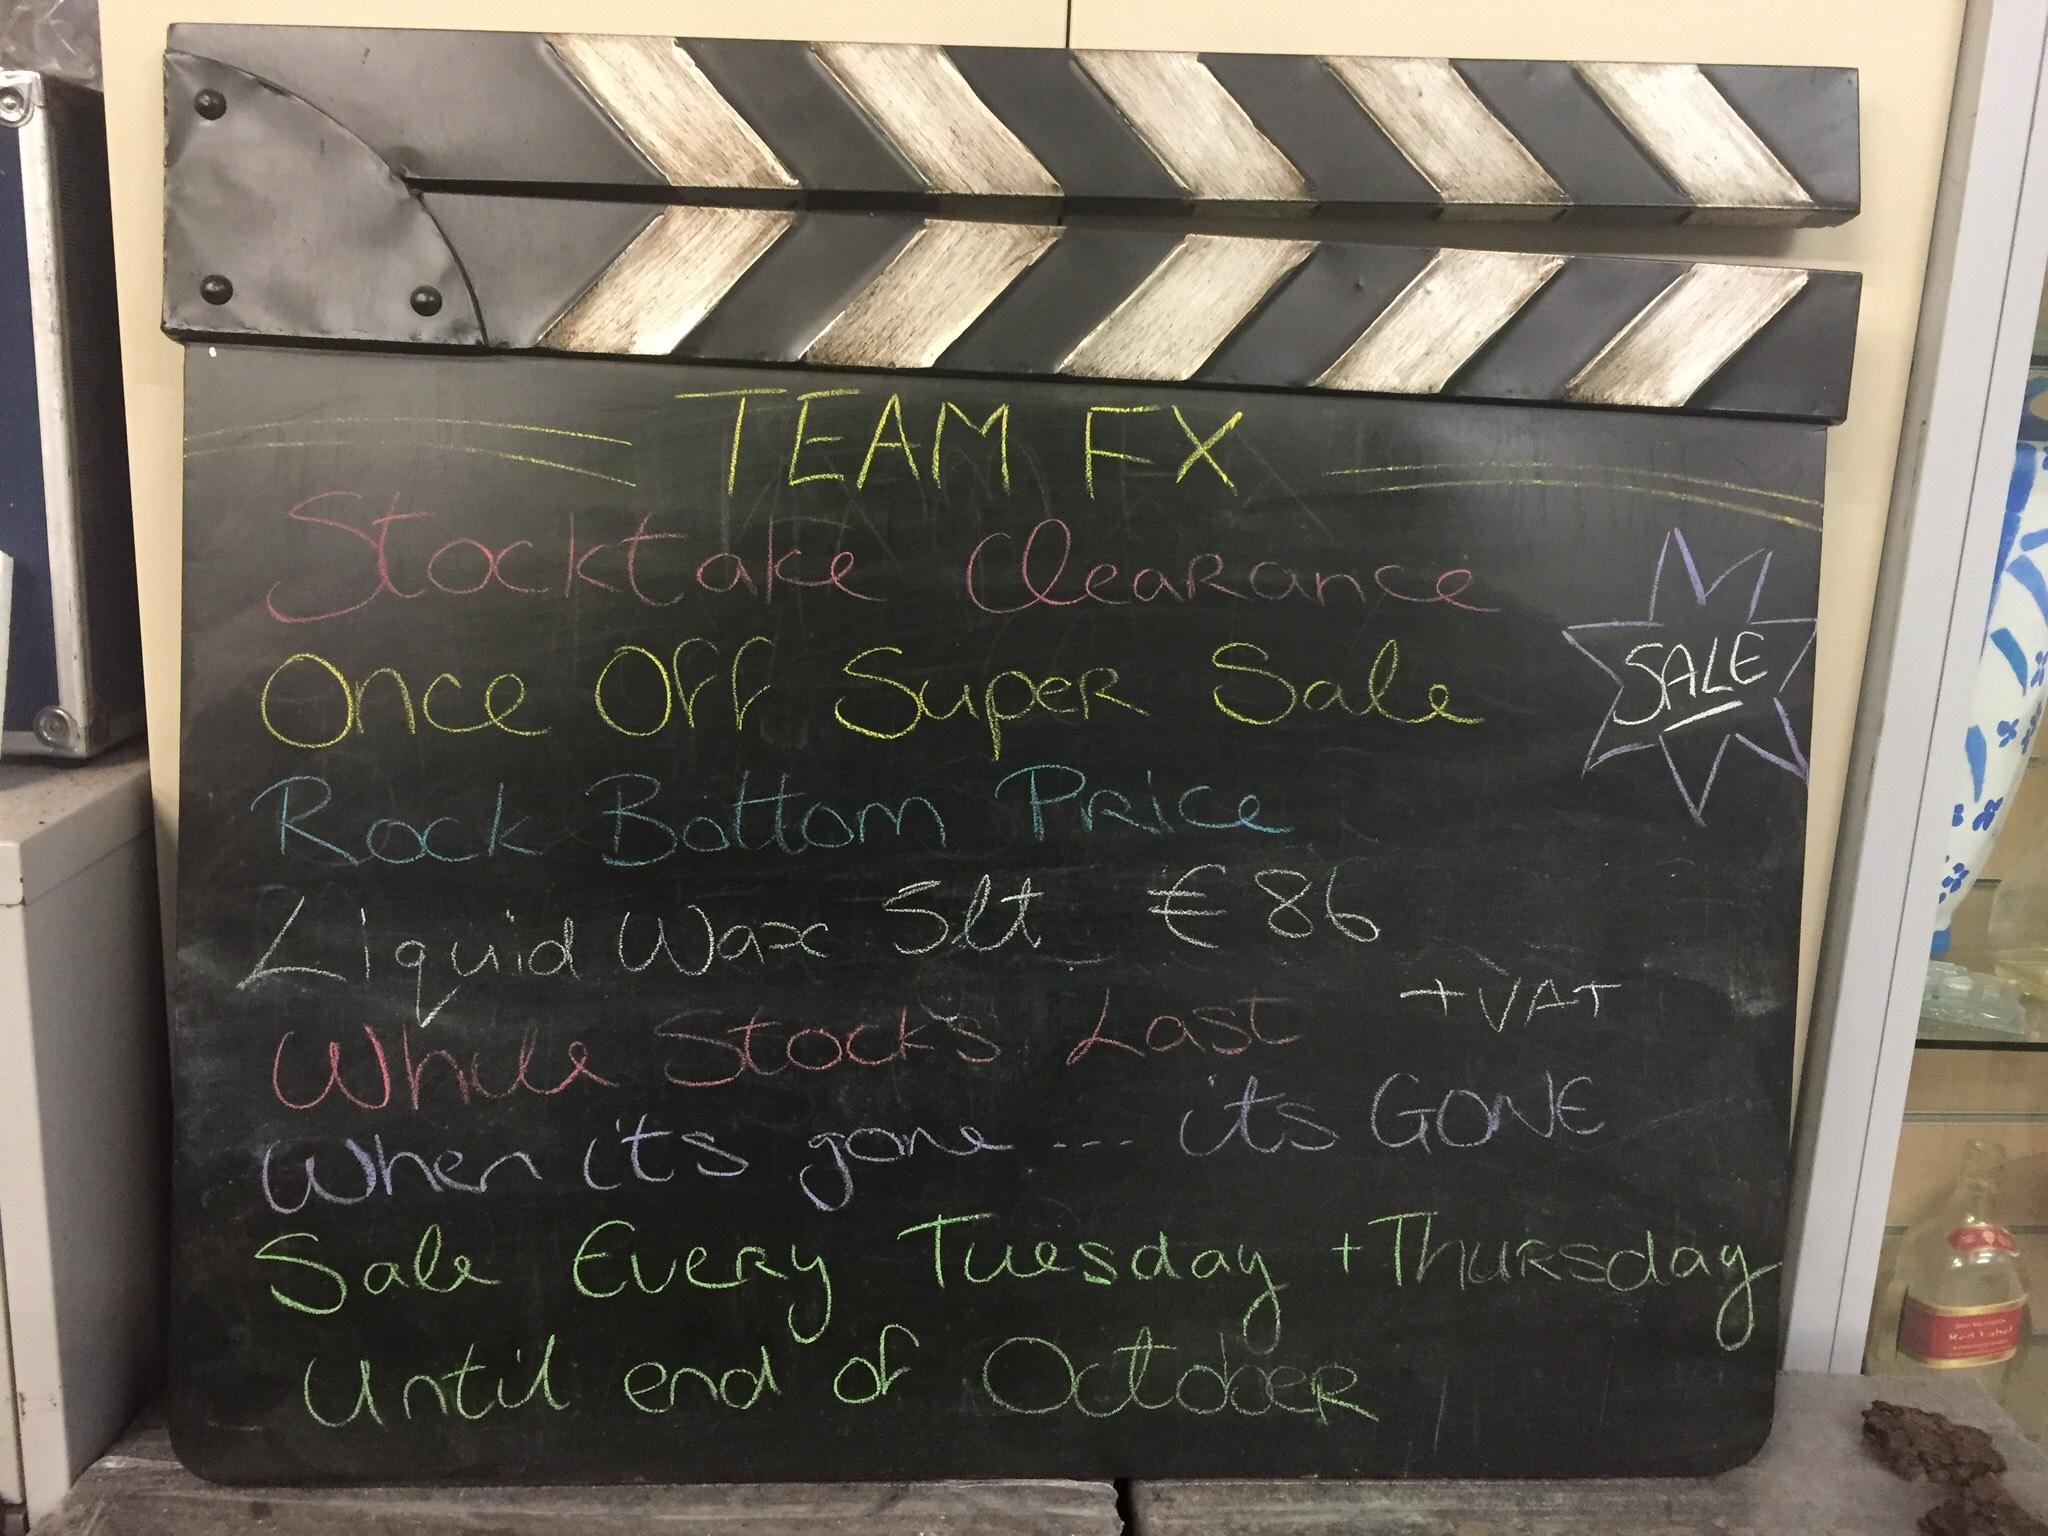 Team FX Stocktake Clearance Once Off Super Sale 5lt Liquid